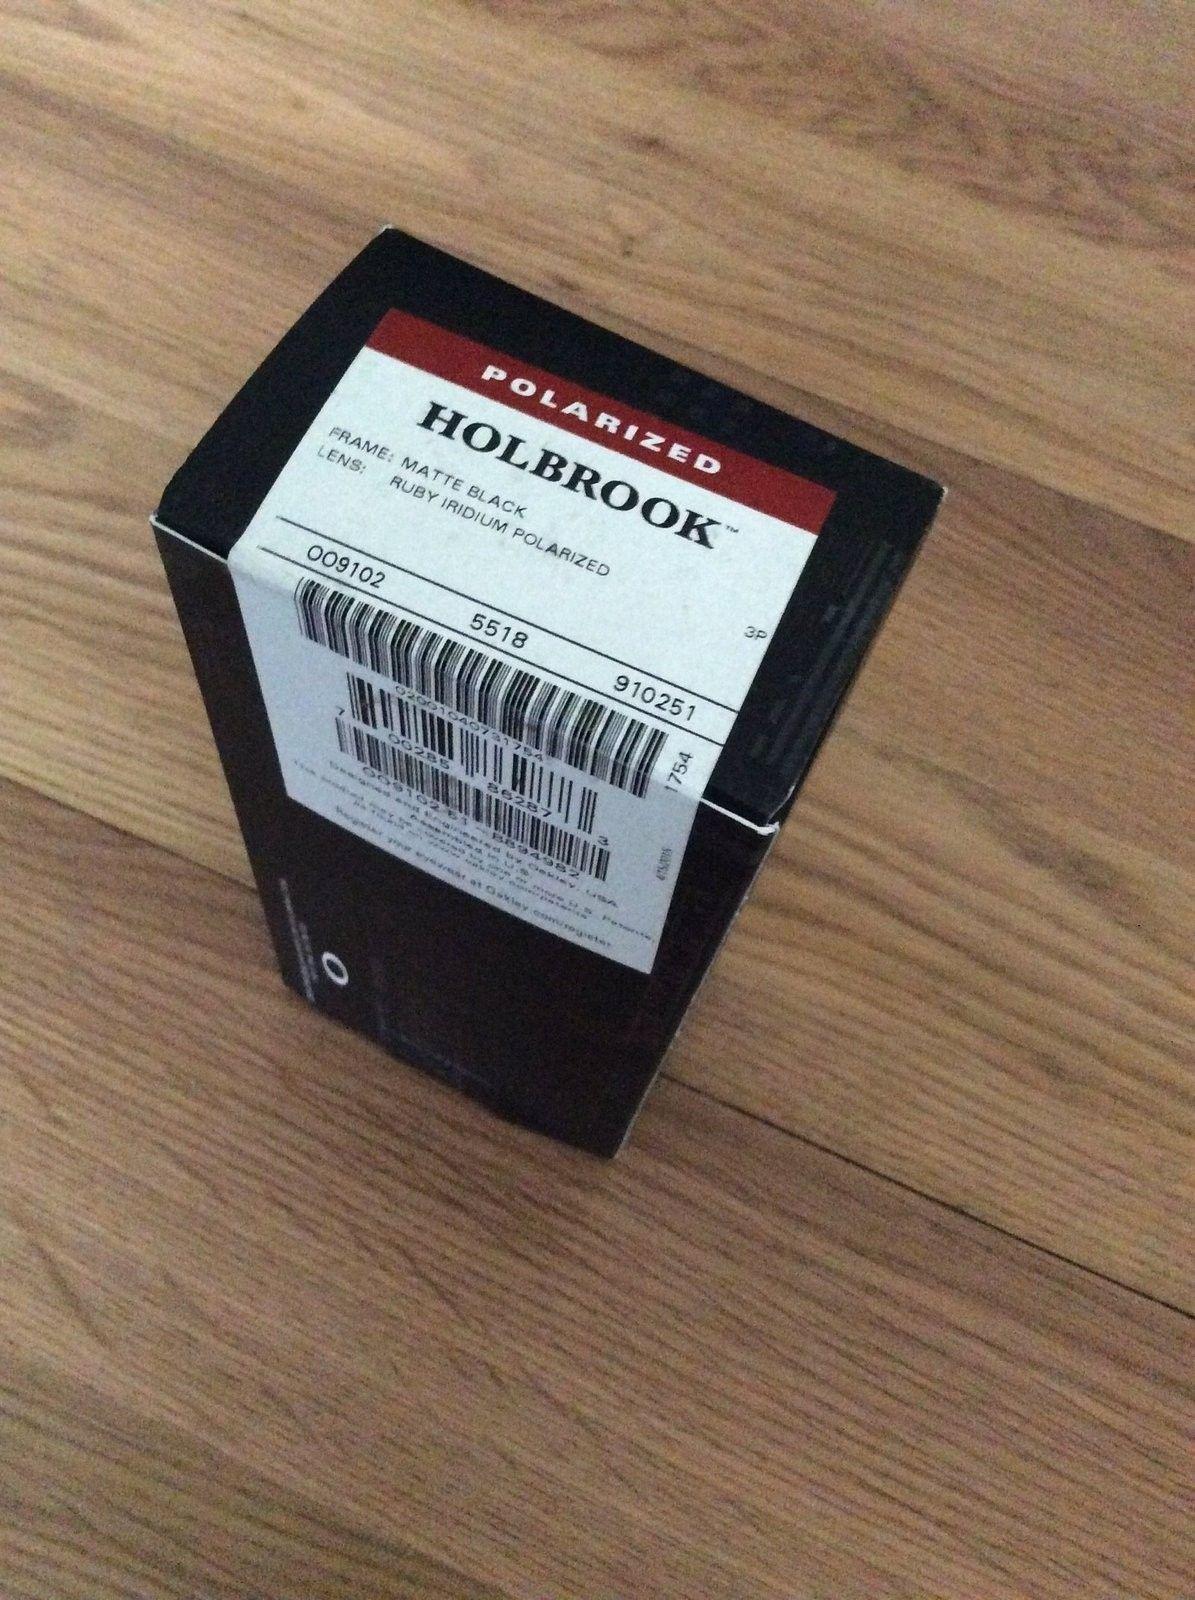 BNIB Holbrook Polar $115 shipped - image.jpg